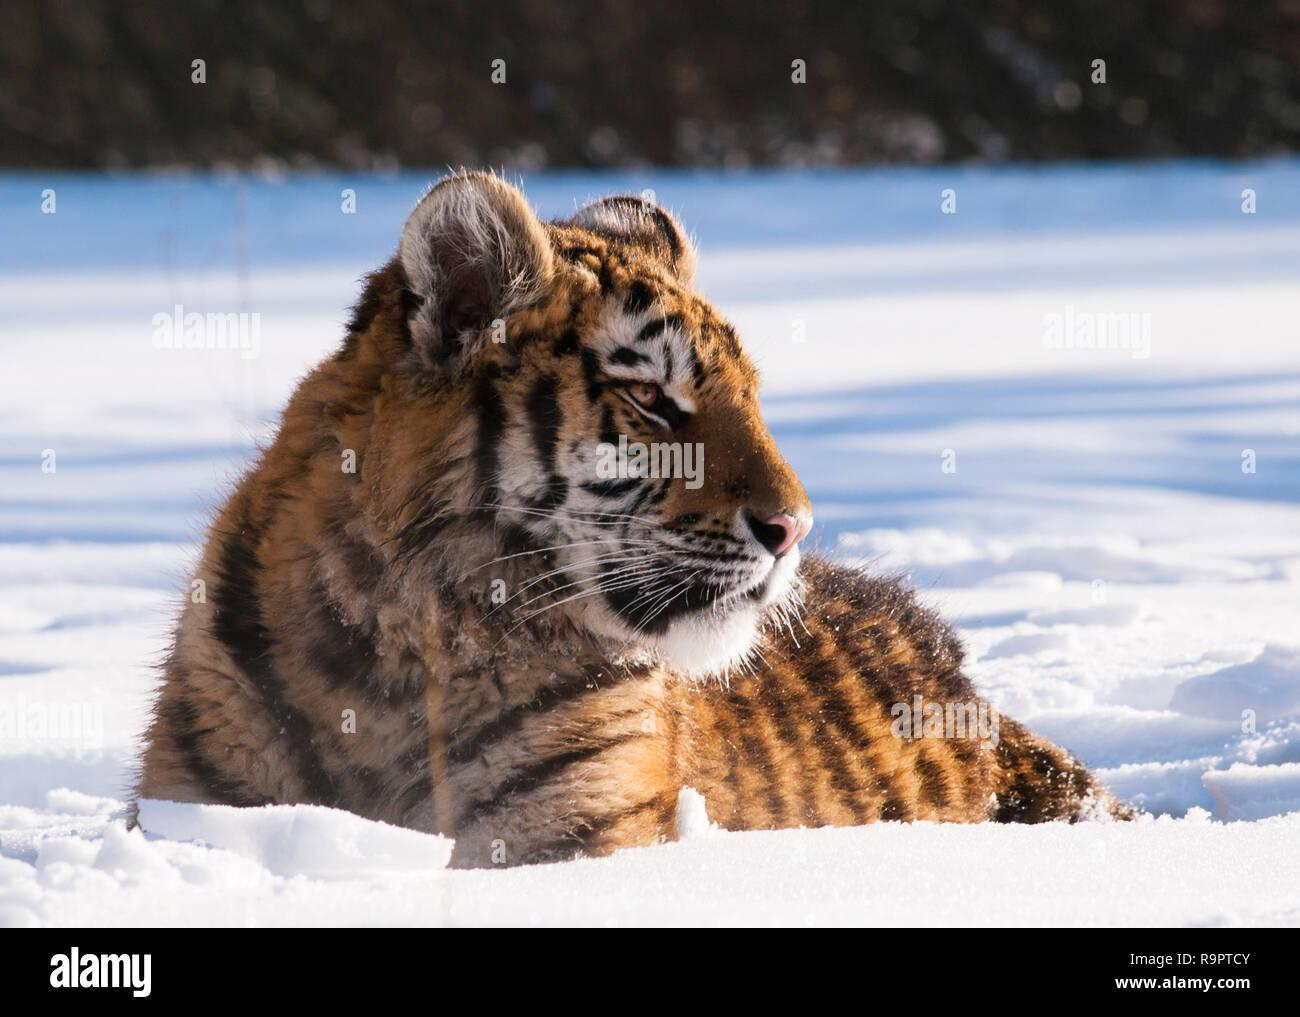 Siberian tiger - Panthera tigris altaica relaxing on snow - Stock Image